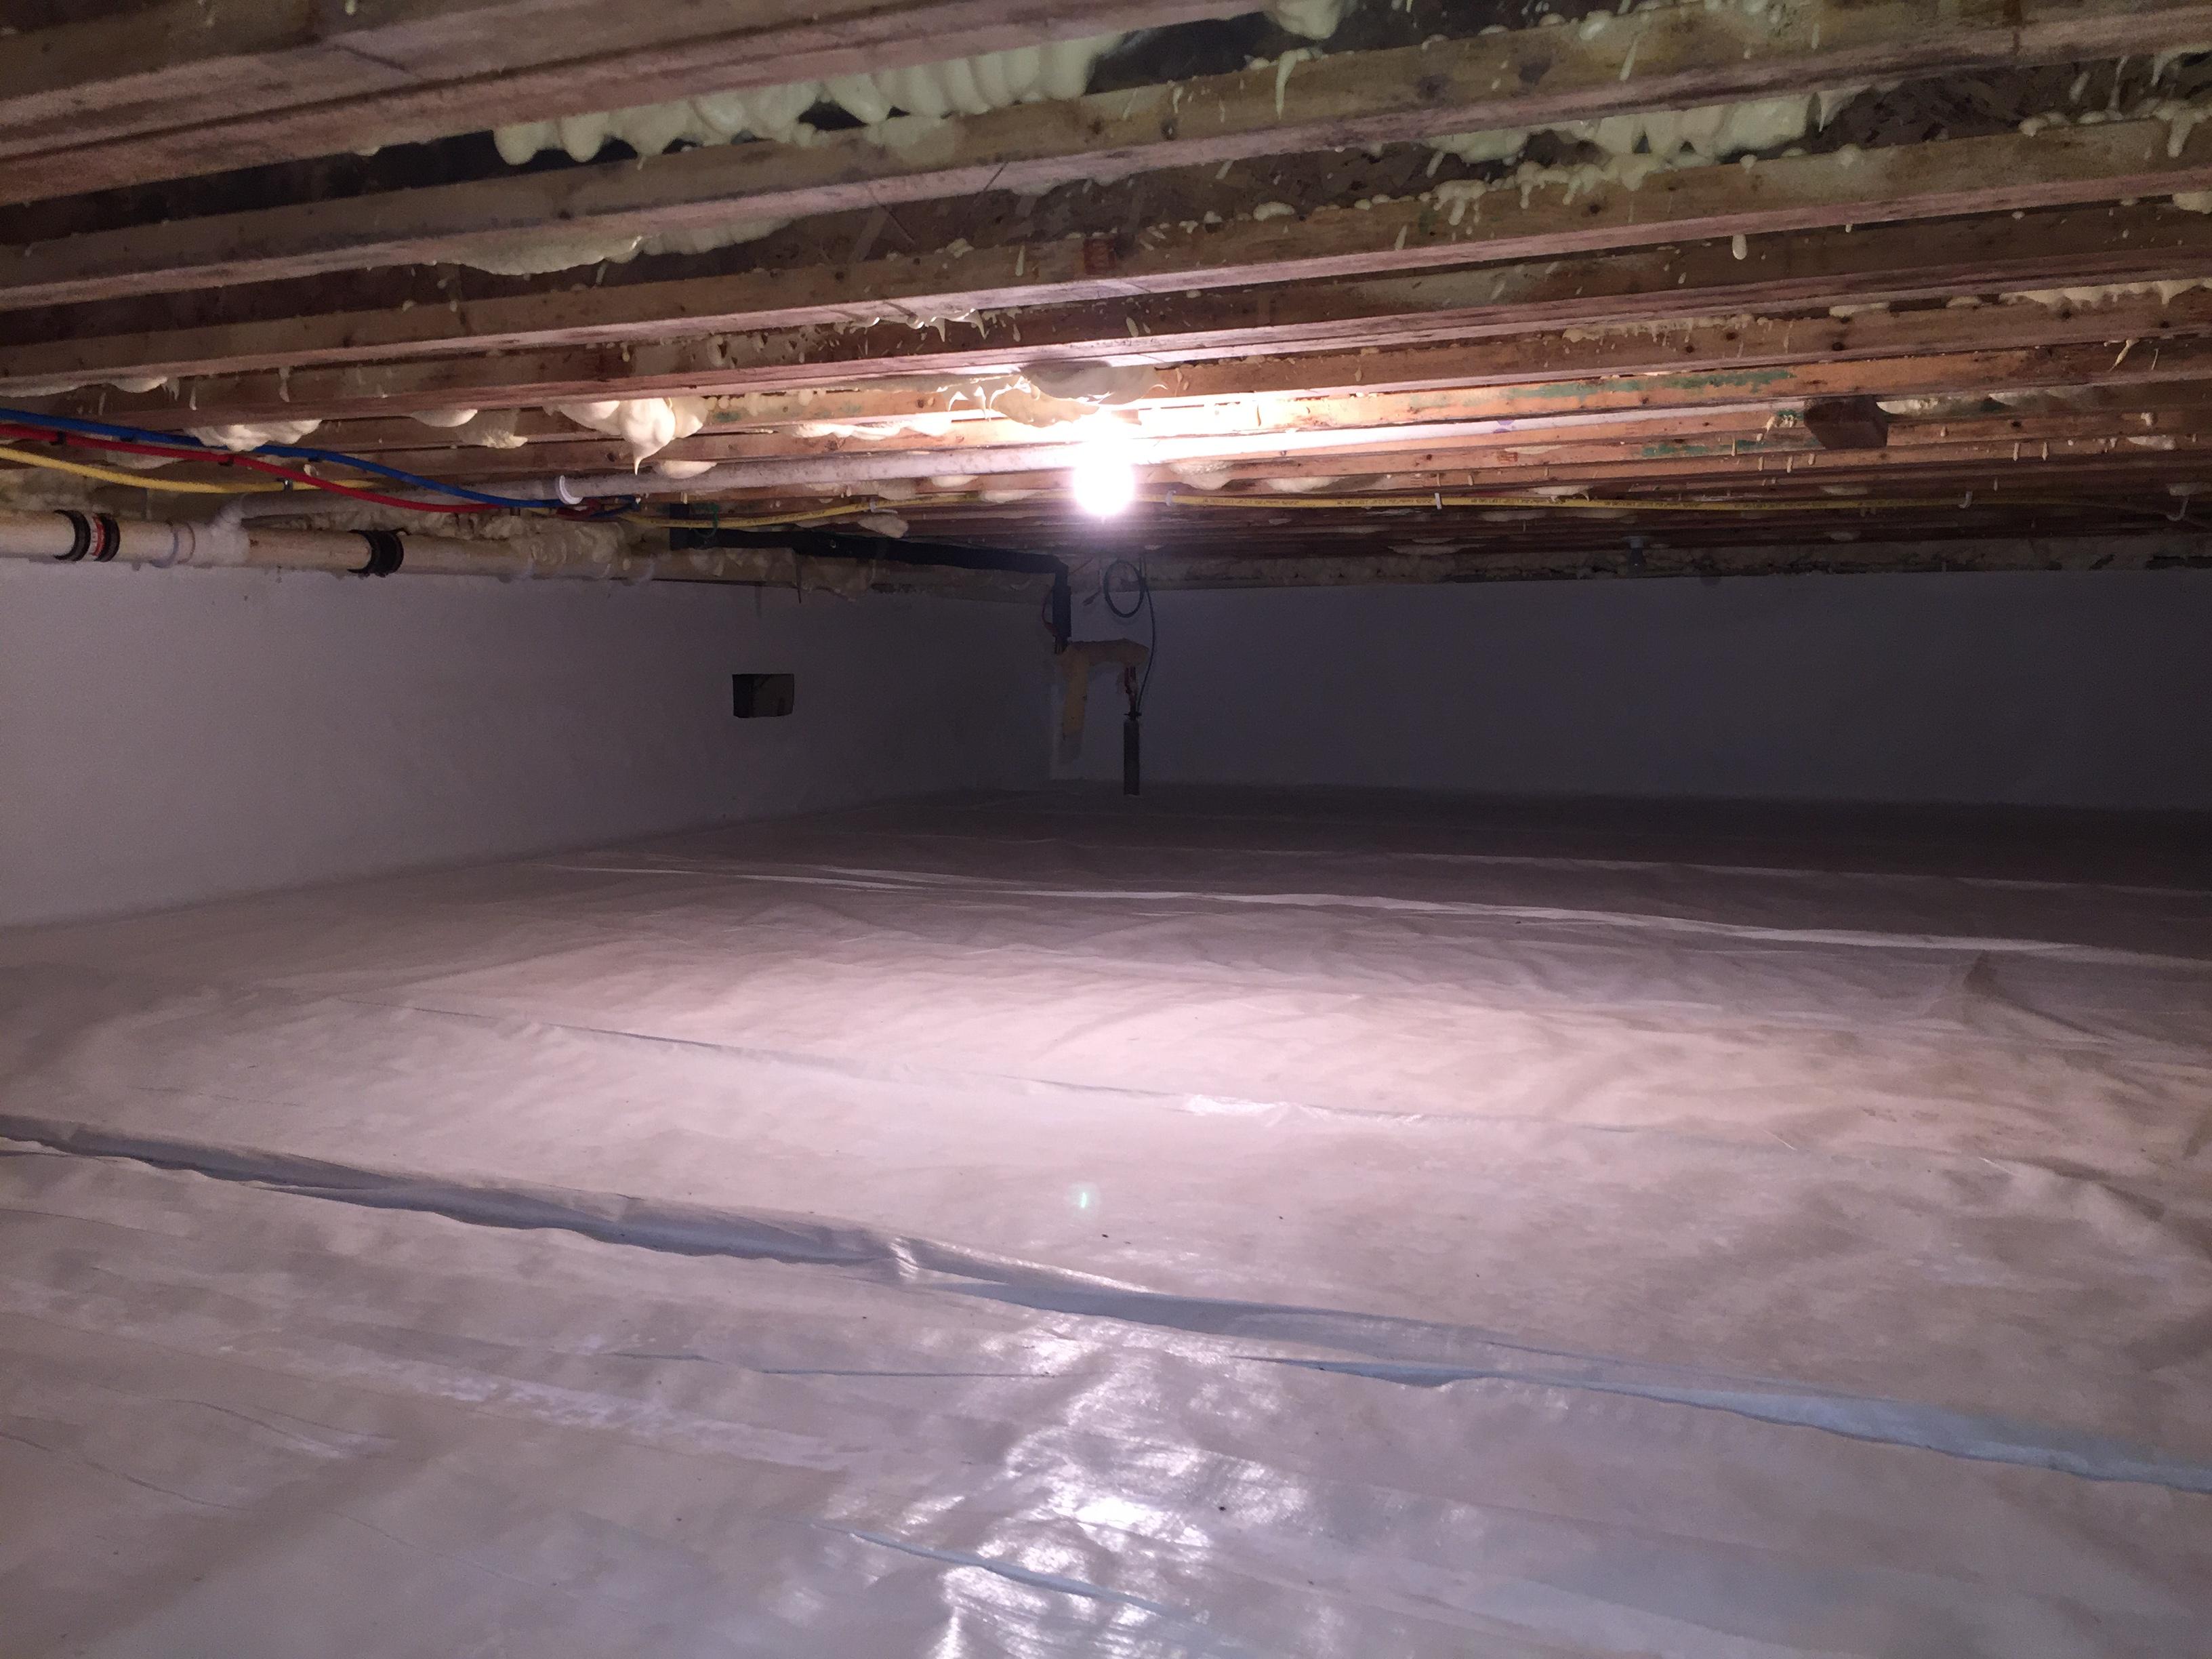 Basement Waterproofing | Stamford, CT | Budget Dry Basement Waterproofing